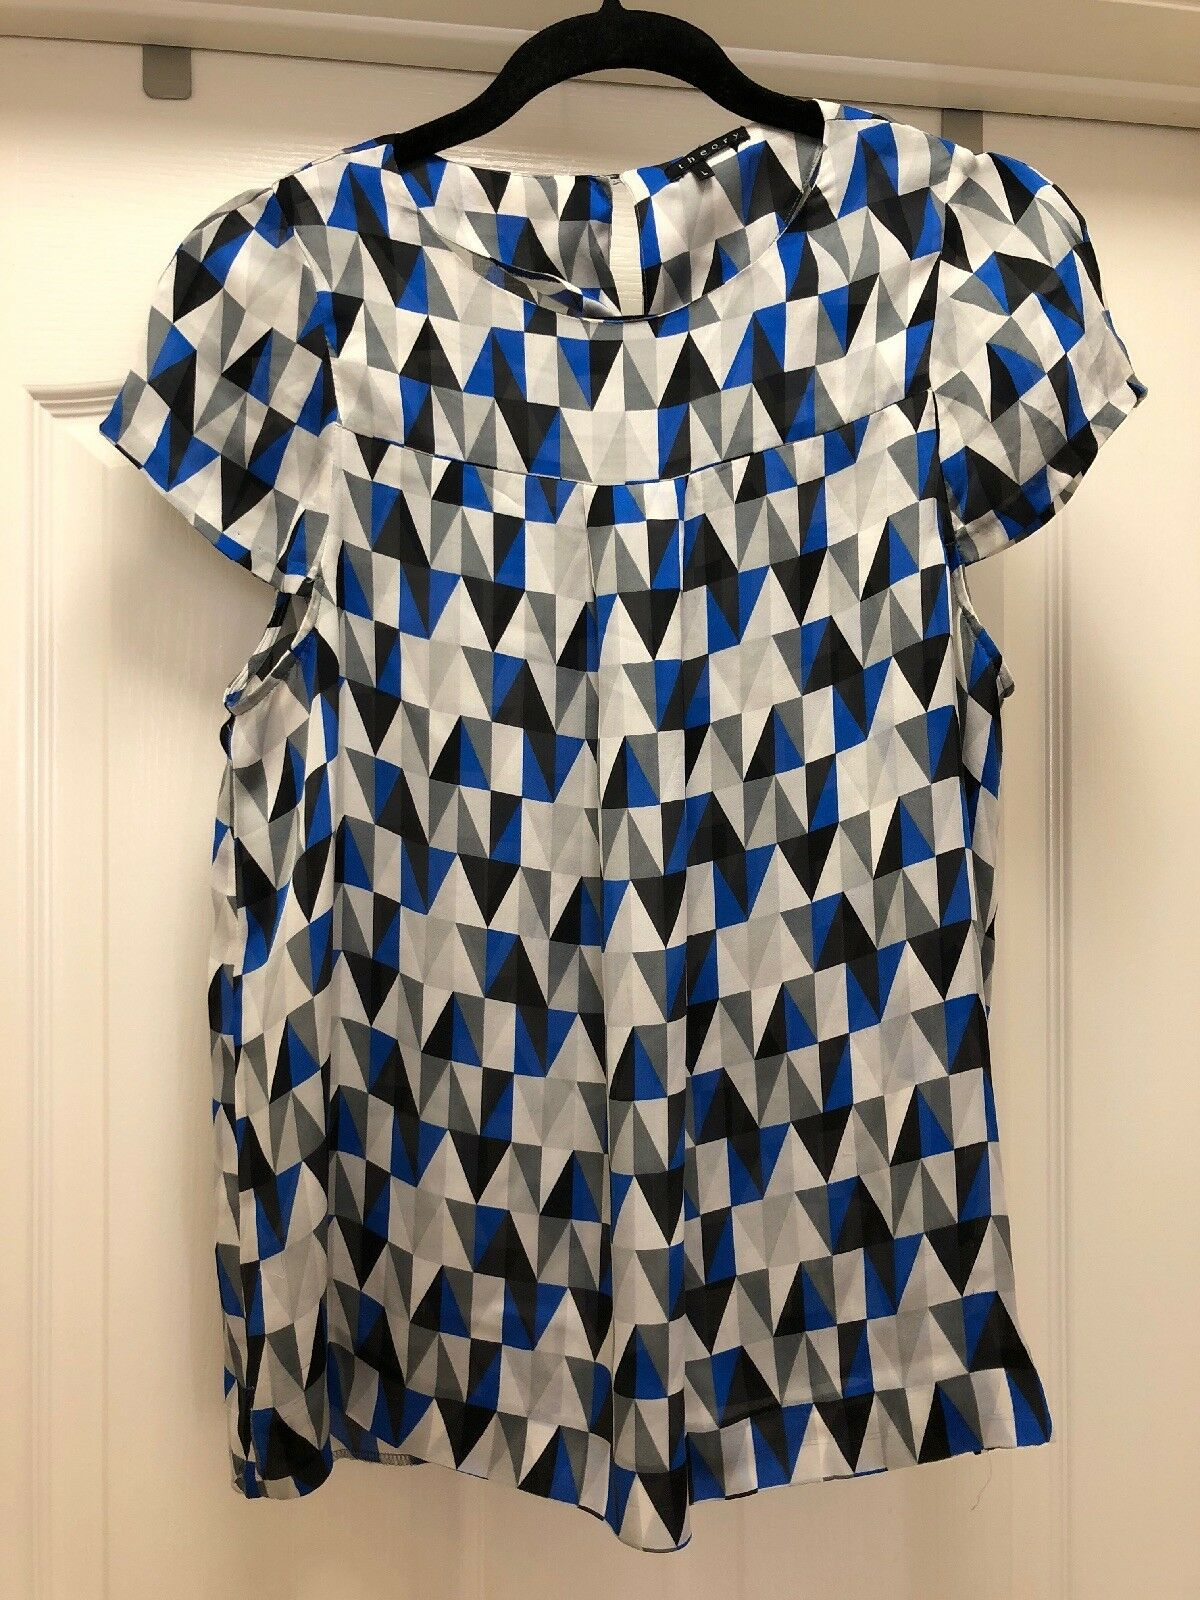 New Theory Silk Abstract Geometric Print Blau Blouse SZ Large